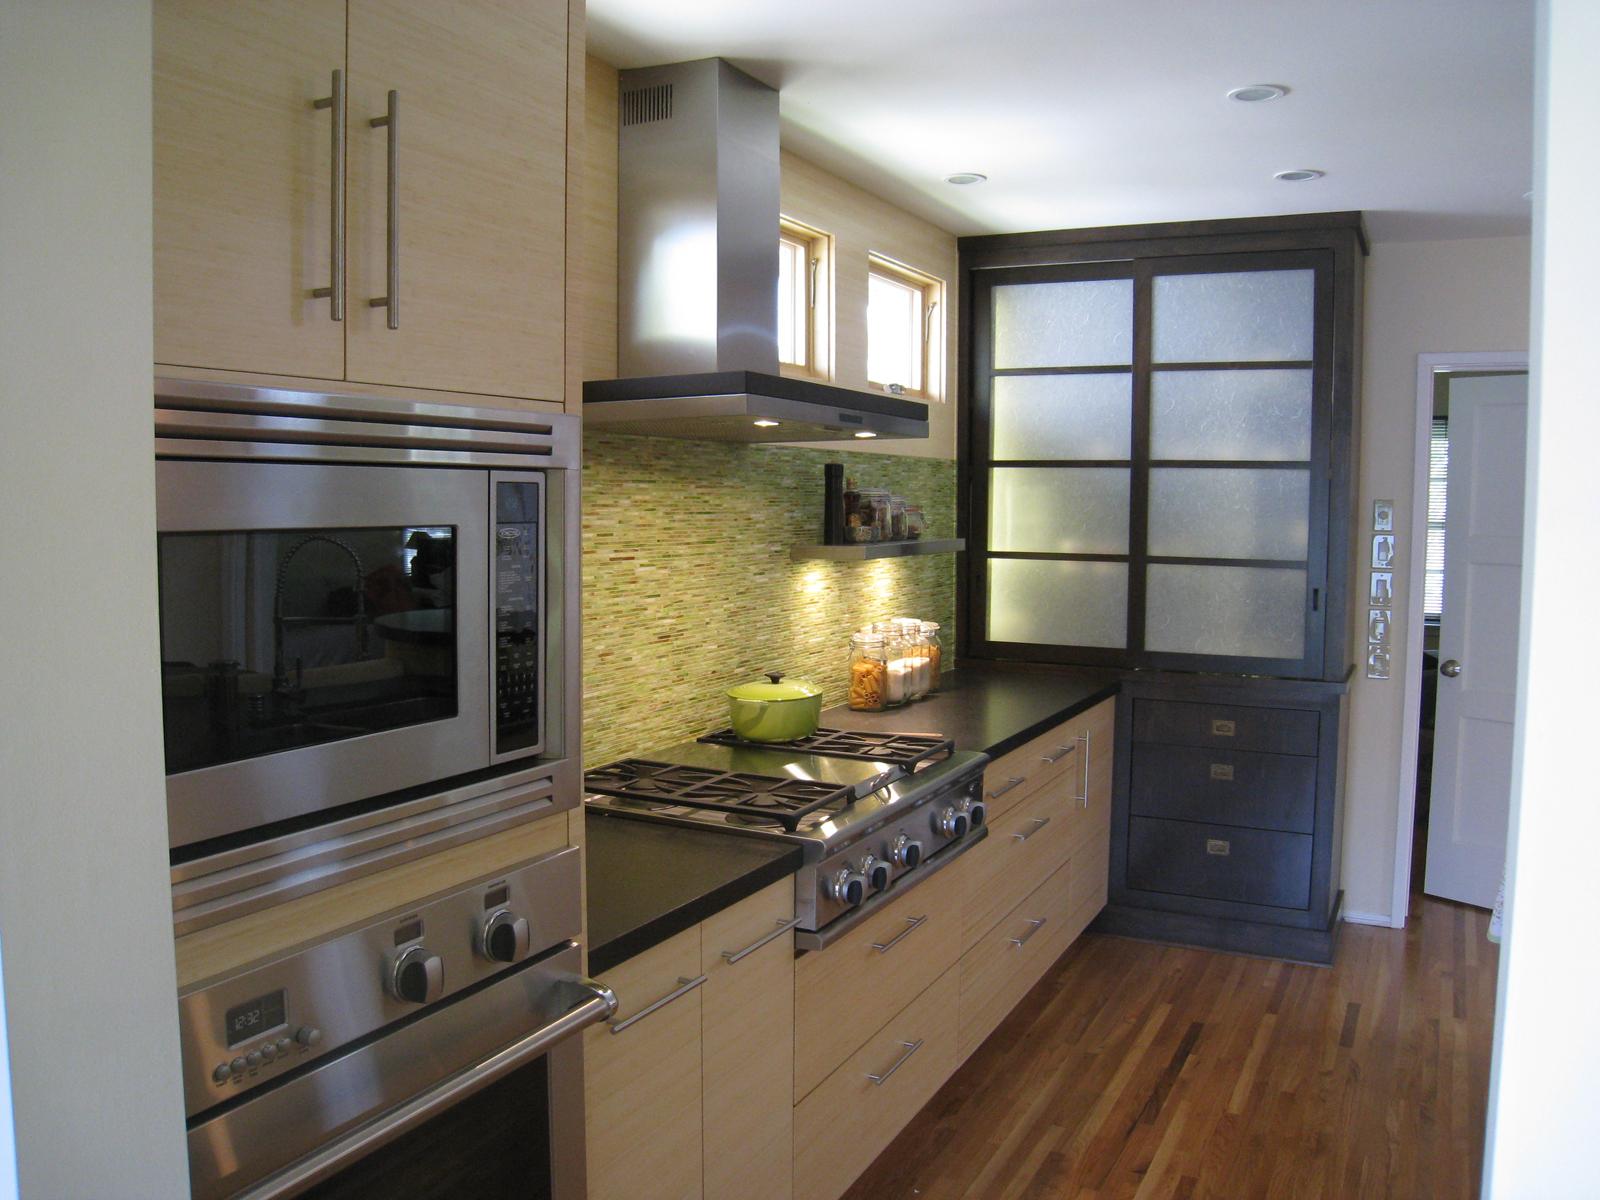 zephyr kitchen contemporary islands design and rewarding contest